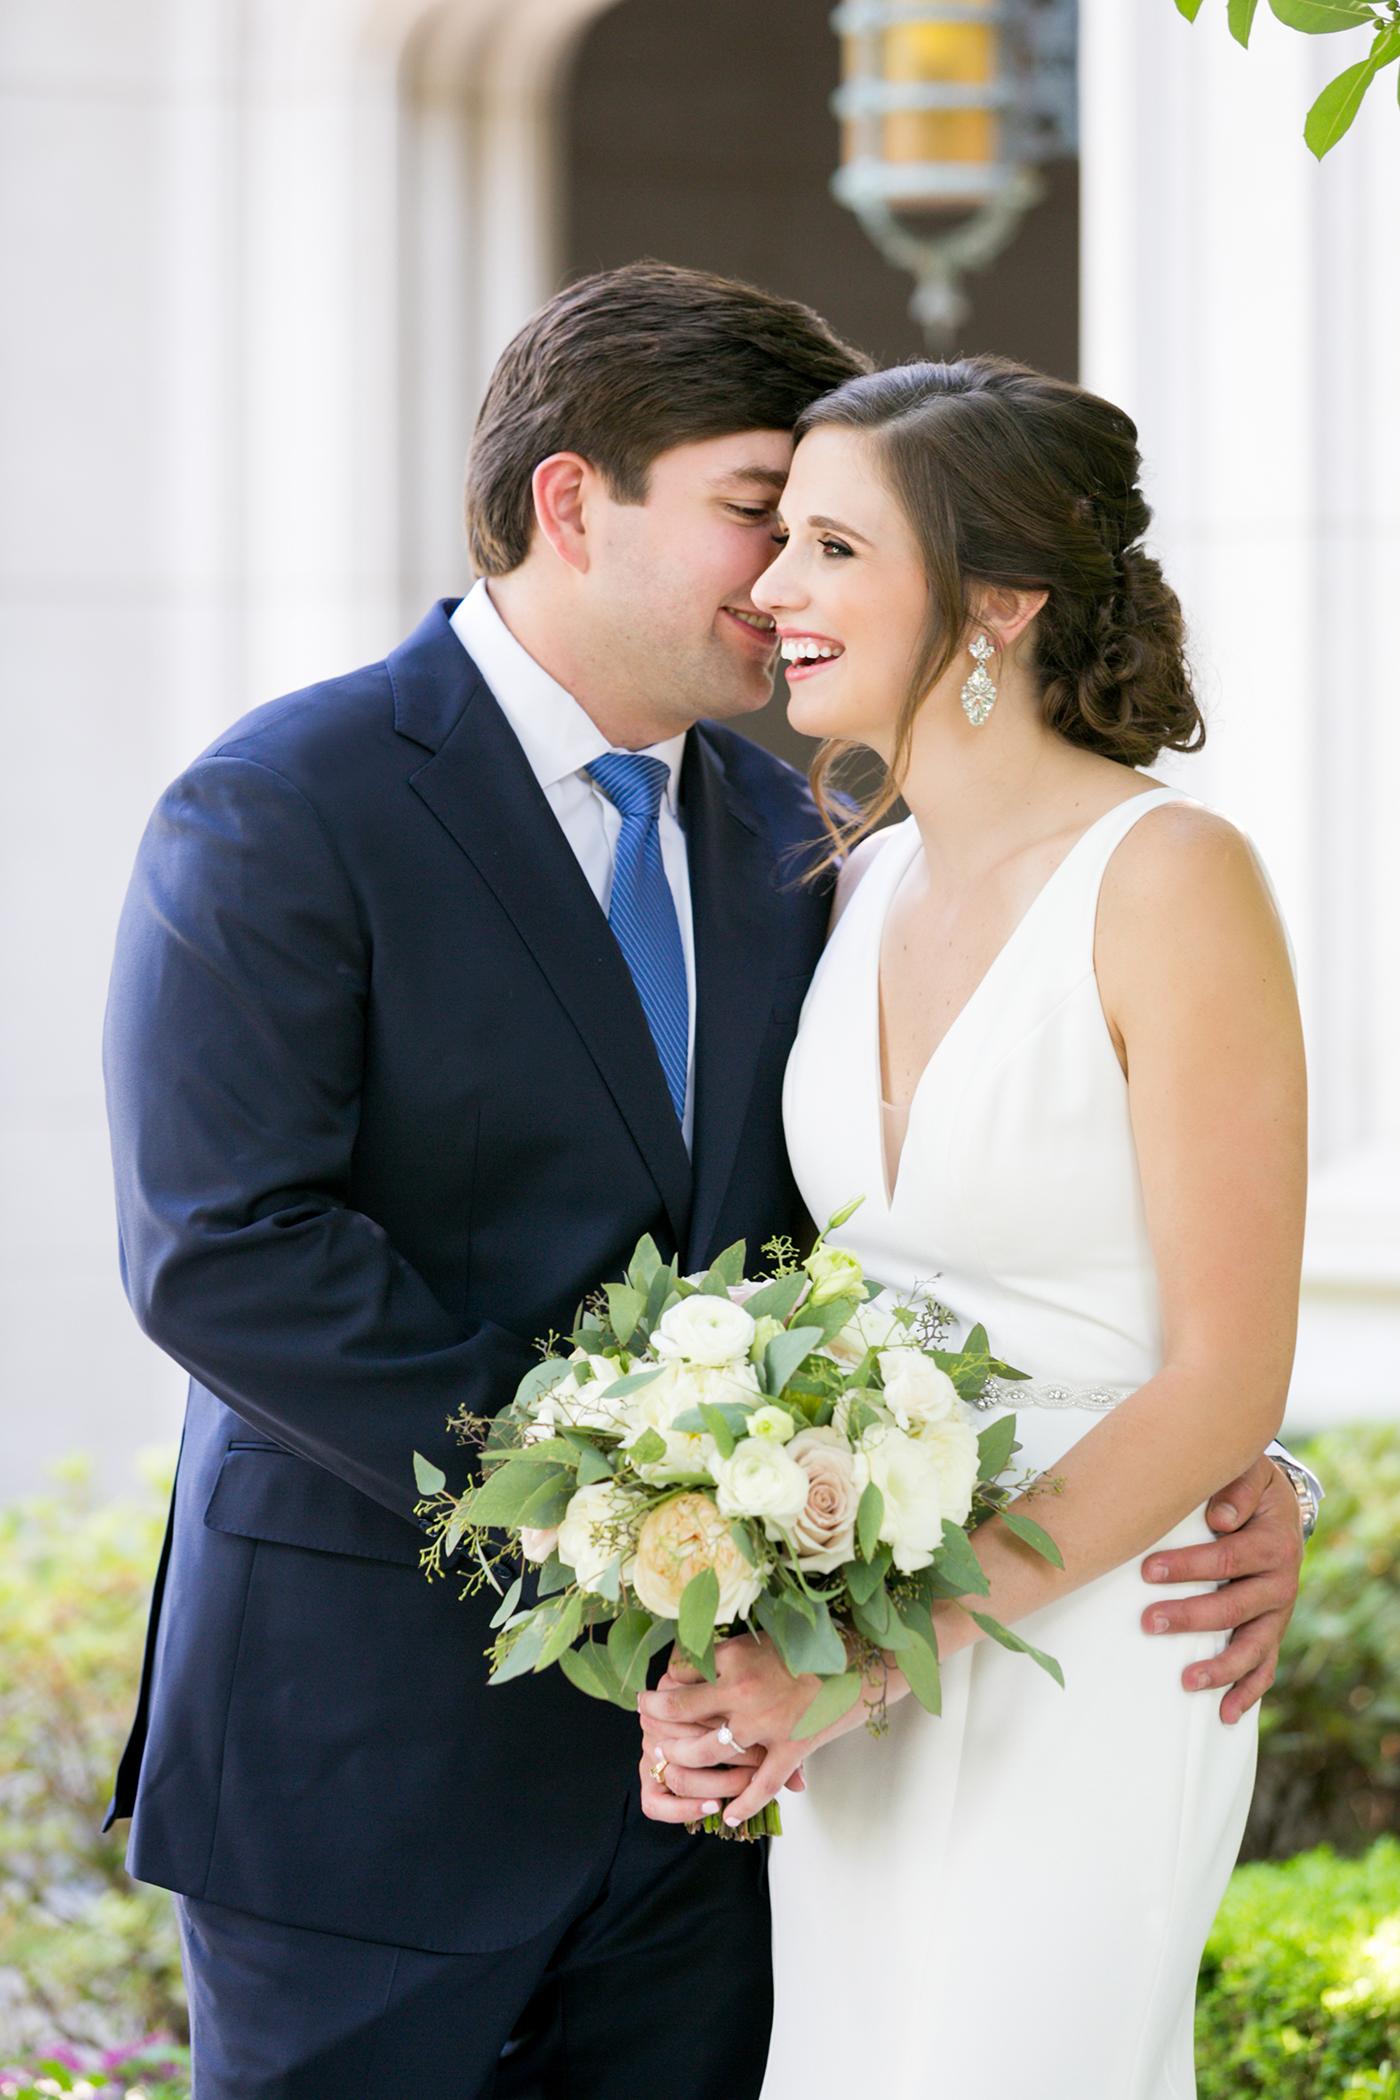 Wedding Planner Dallas TX - Allday Events - Highland Park - Marie Gabrielle Wedding - 169.jpg